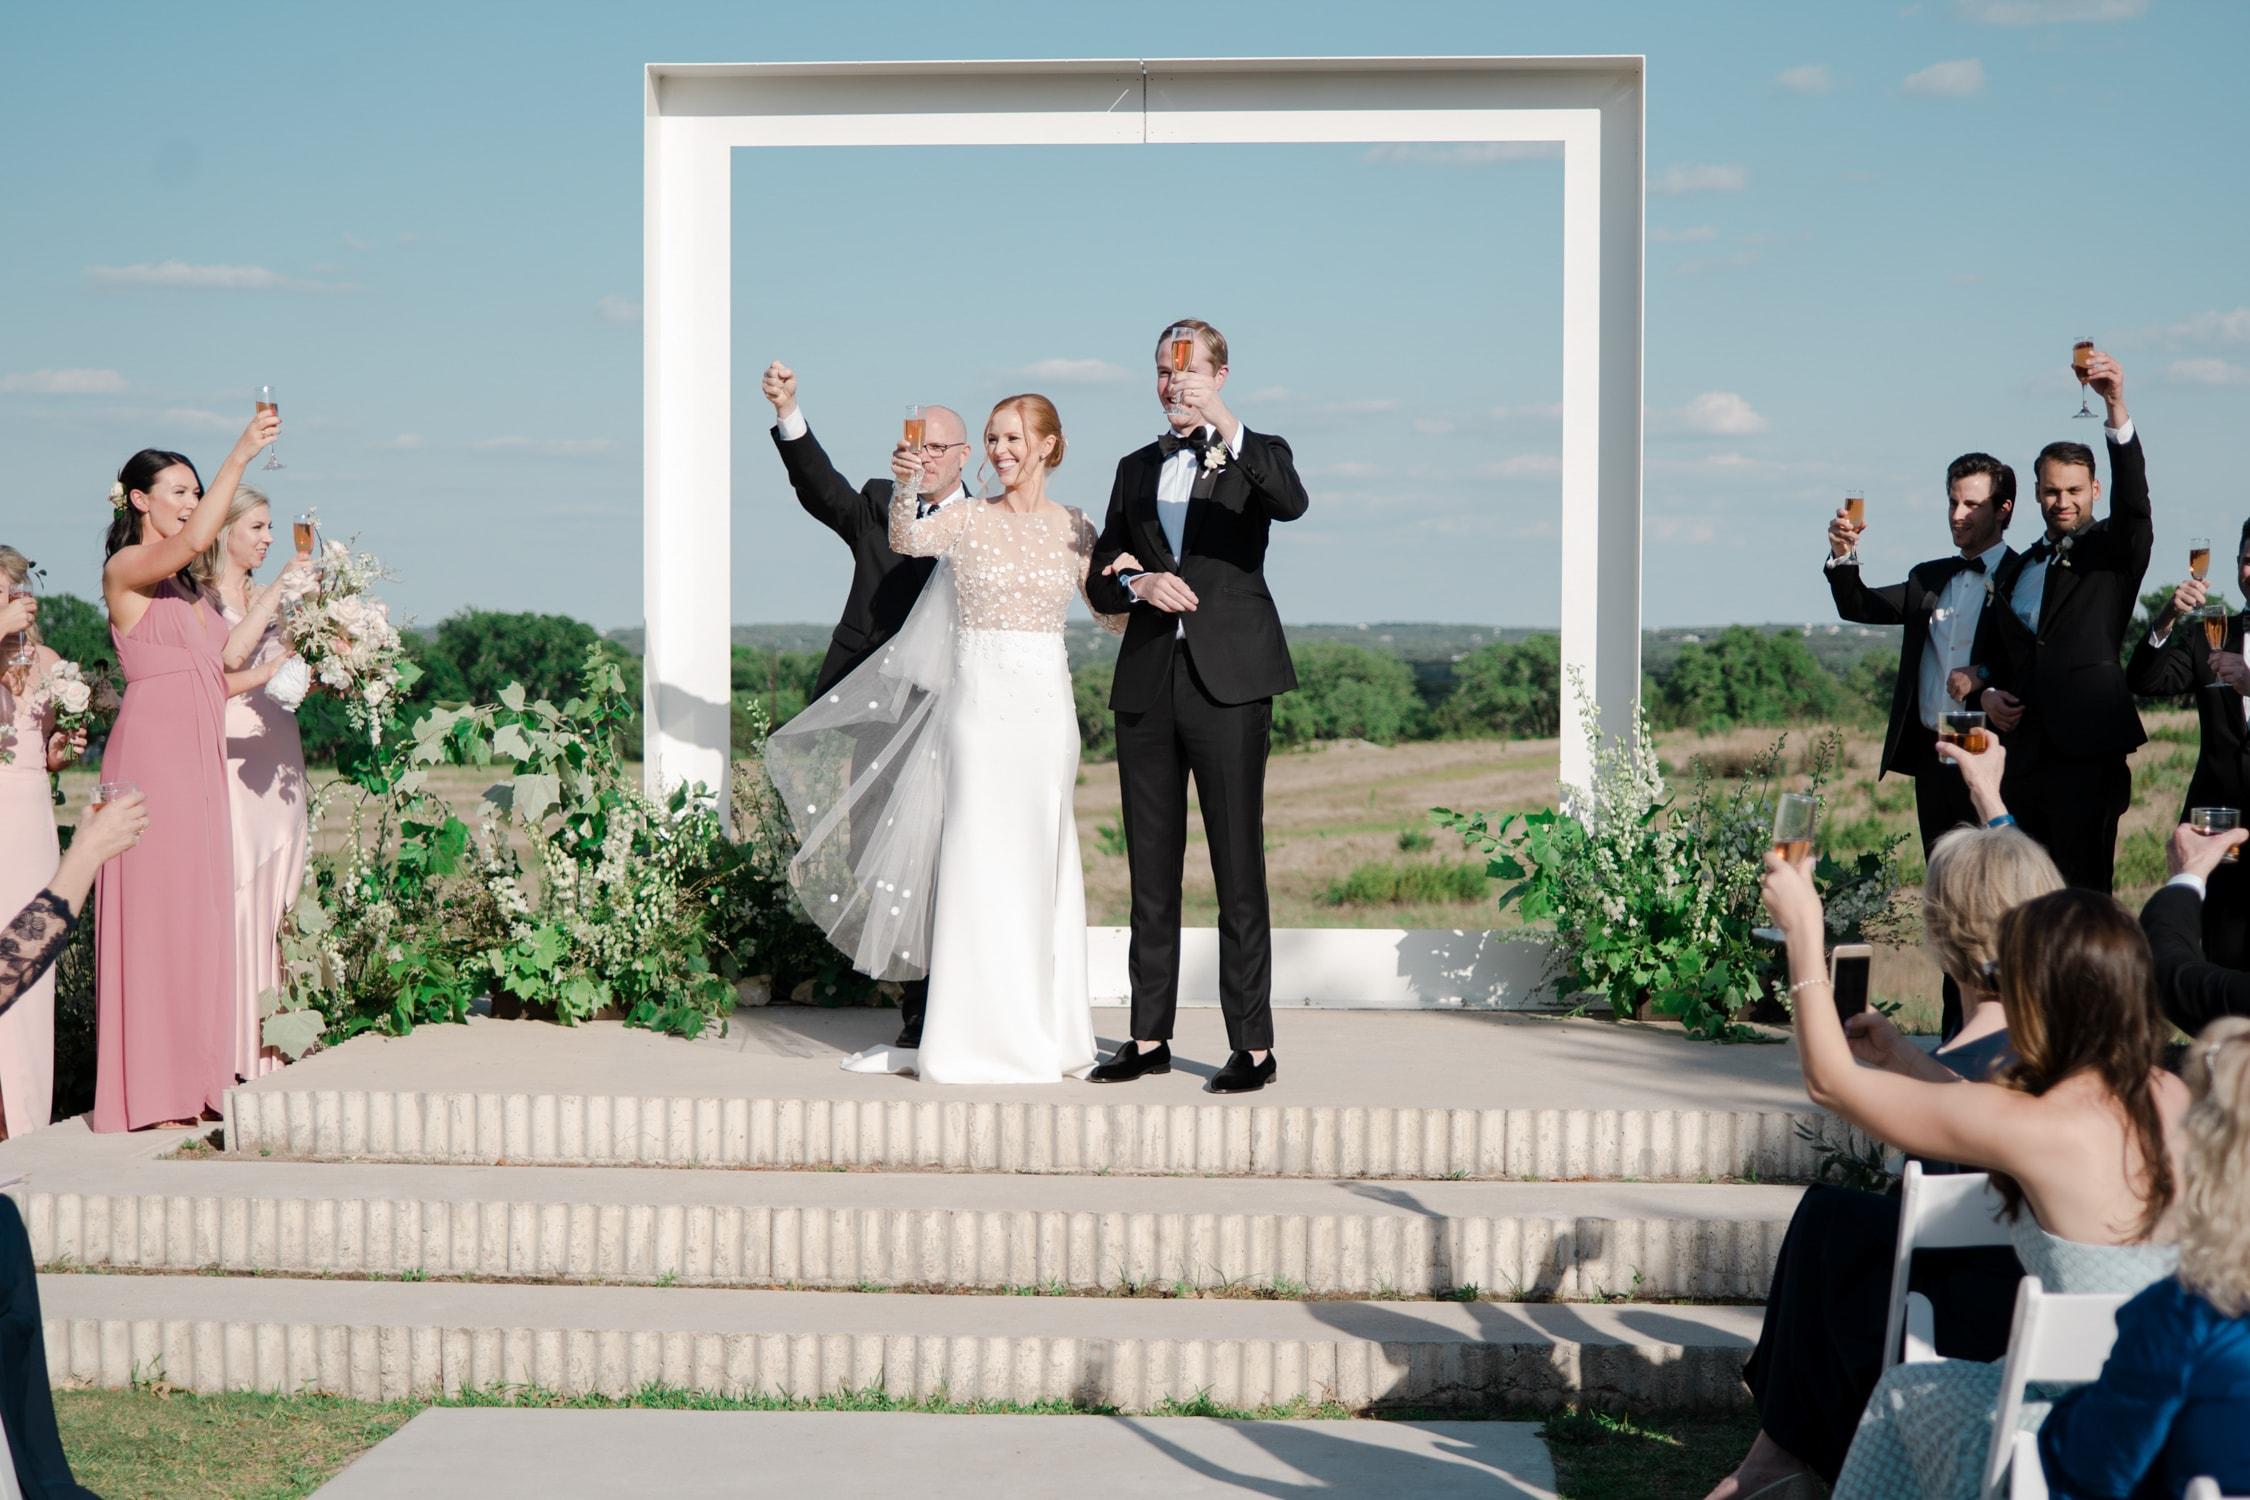 prospect-house-wedding-27.jpg